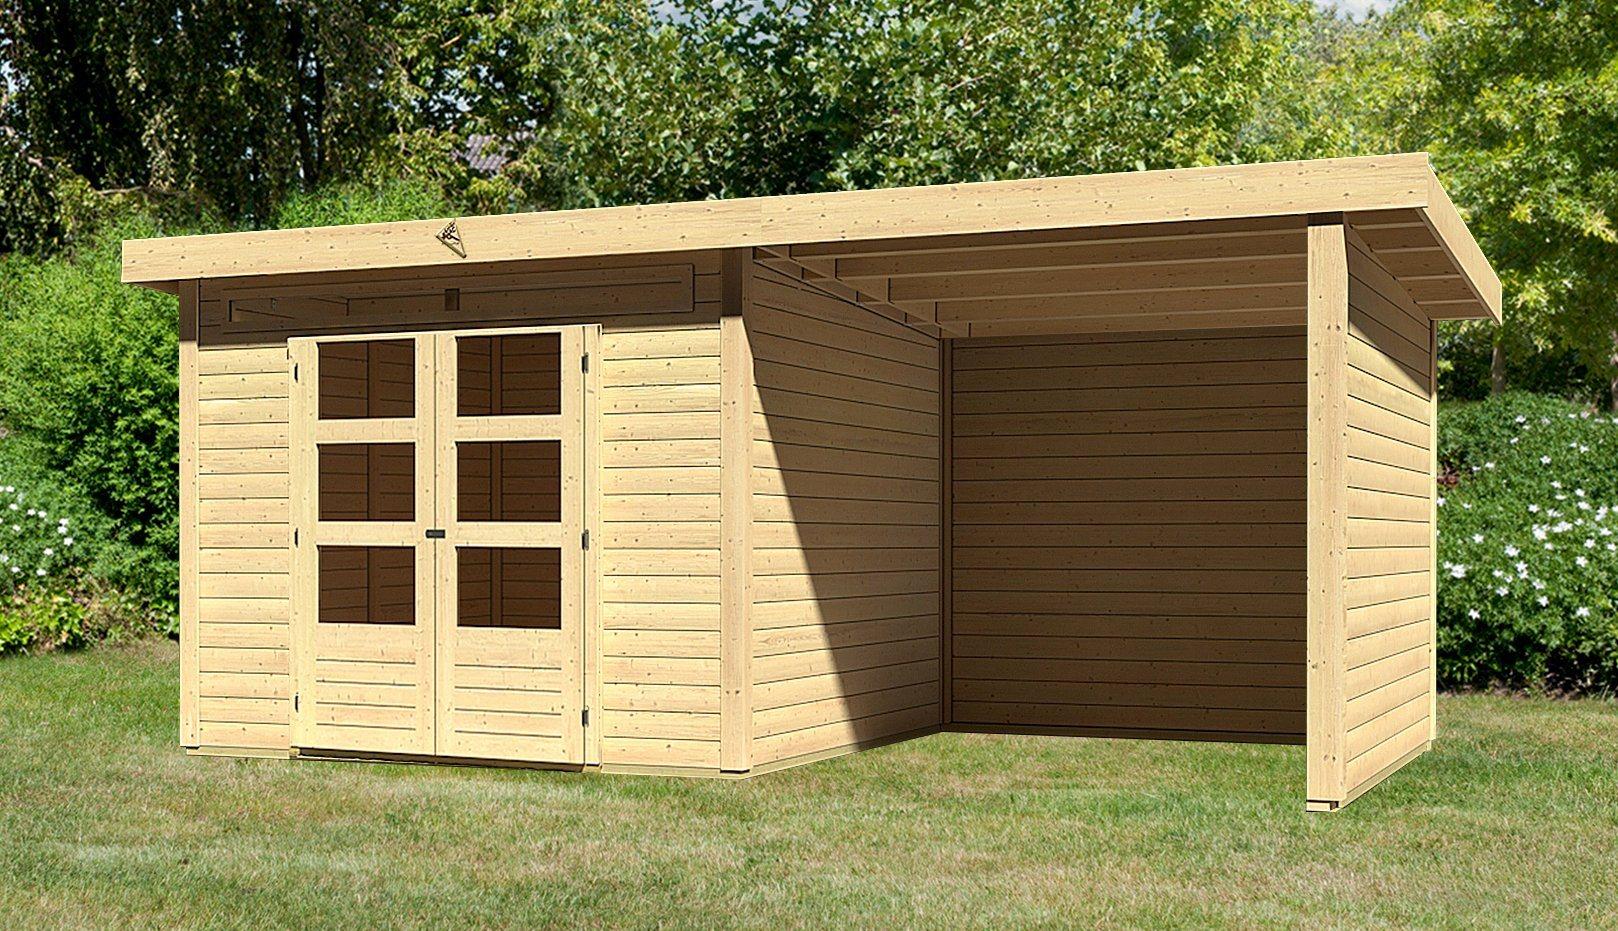 KARIBU Gartenhaus »Kandern 6«, Gesamtmaß (BxT): 552x303 cm, mit Anbaudach | Garten > Gartenhäuser | Karibu